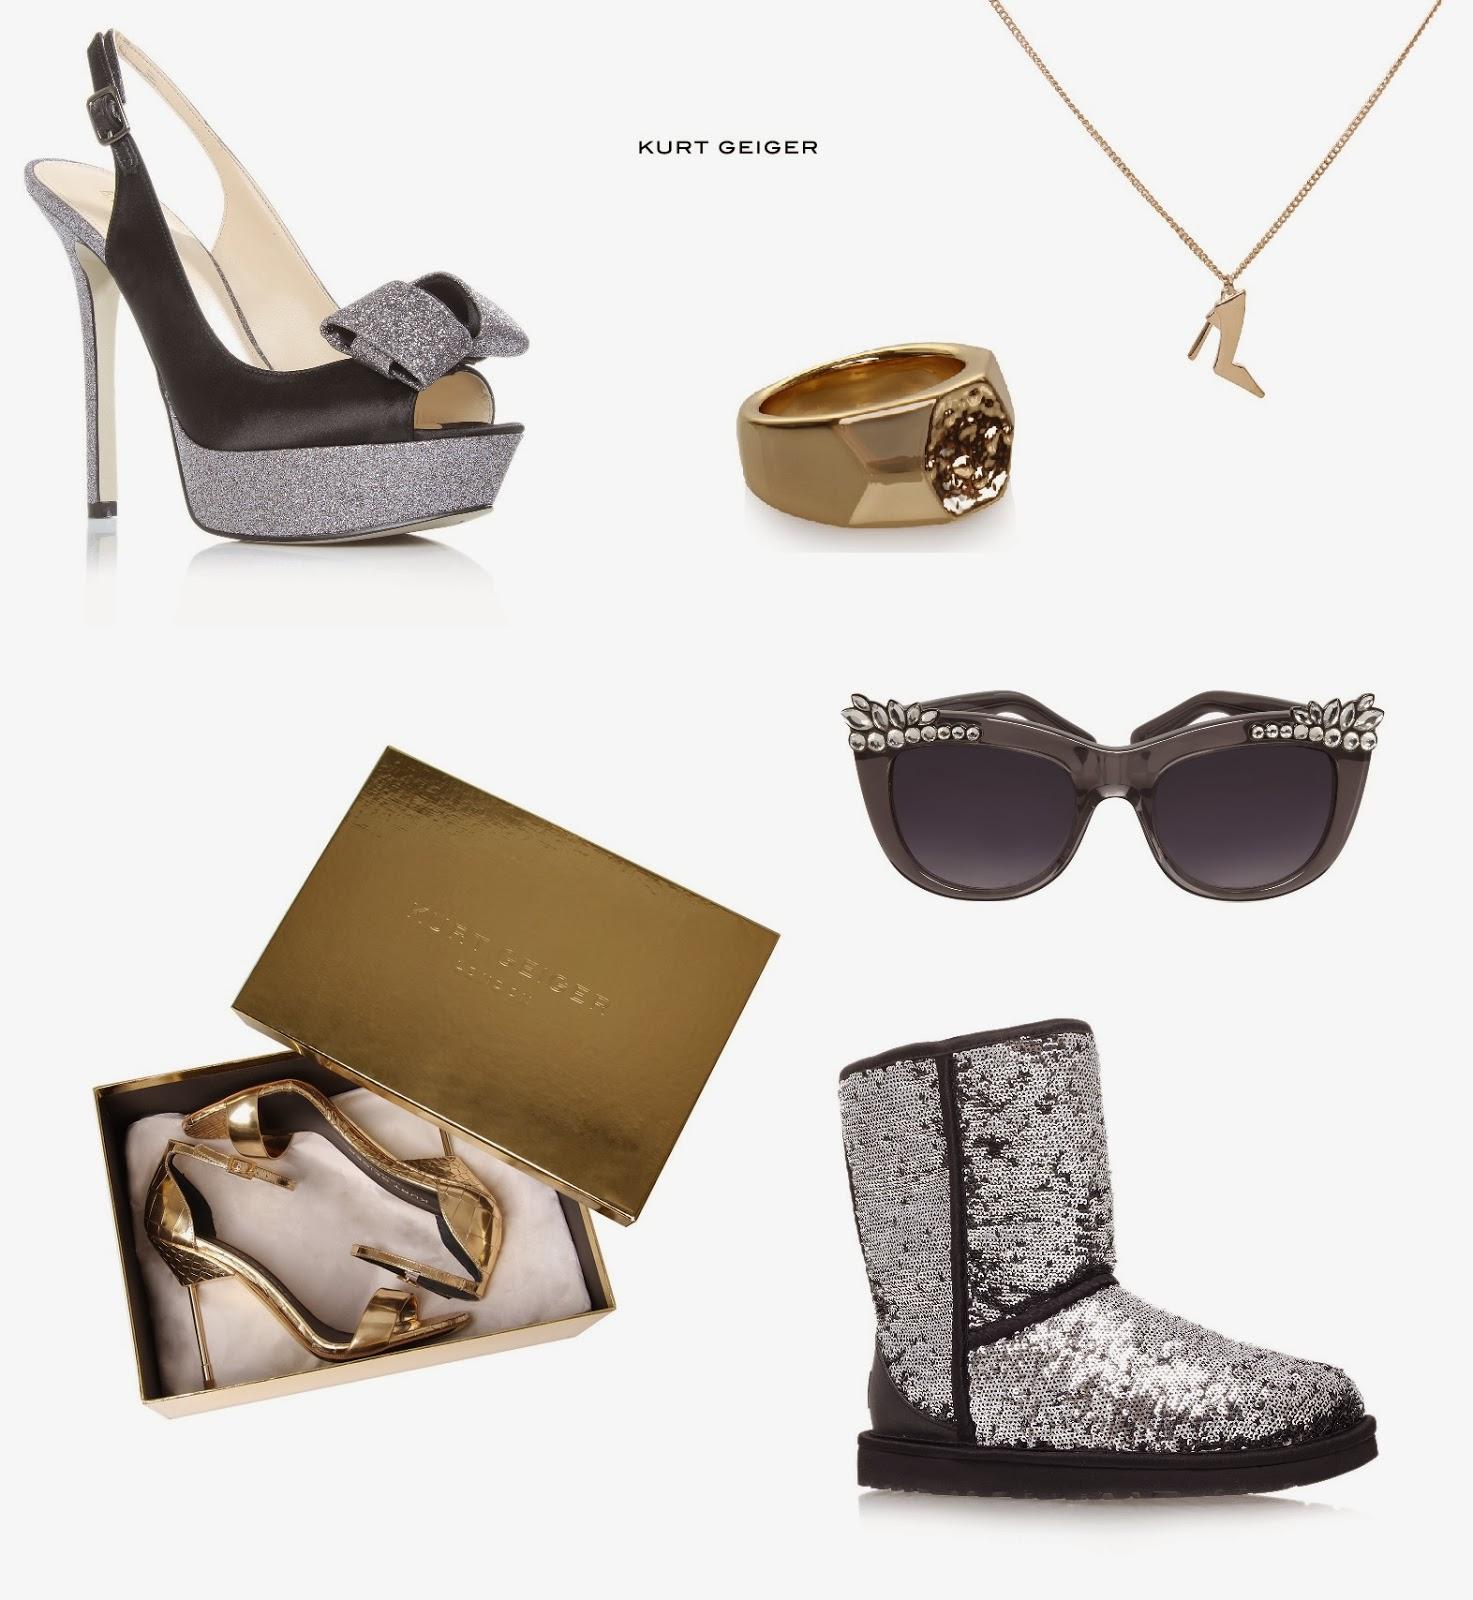 Kurt Geiger Sequin Dolly Court Shoes